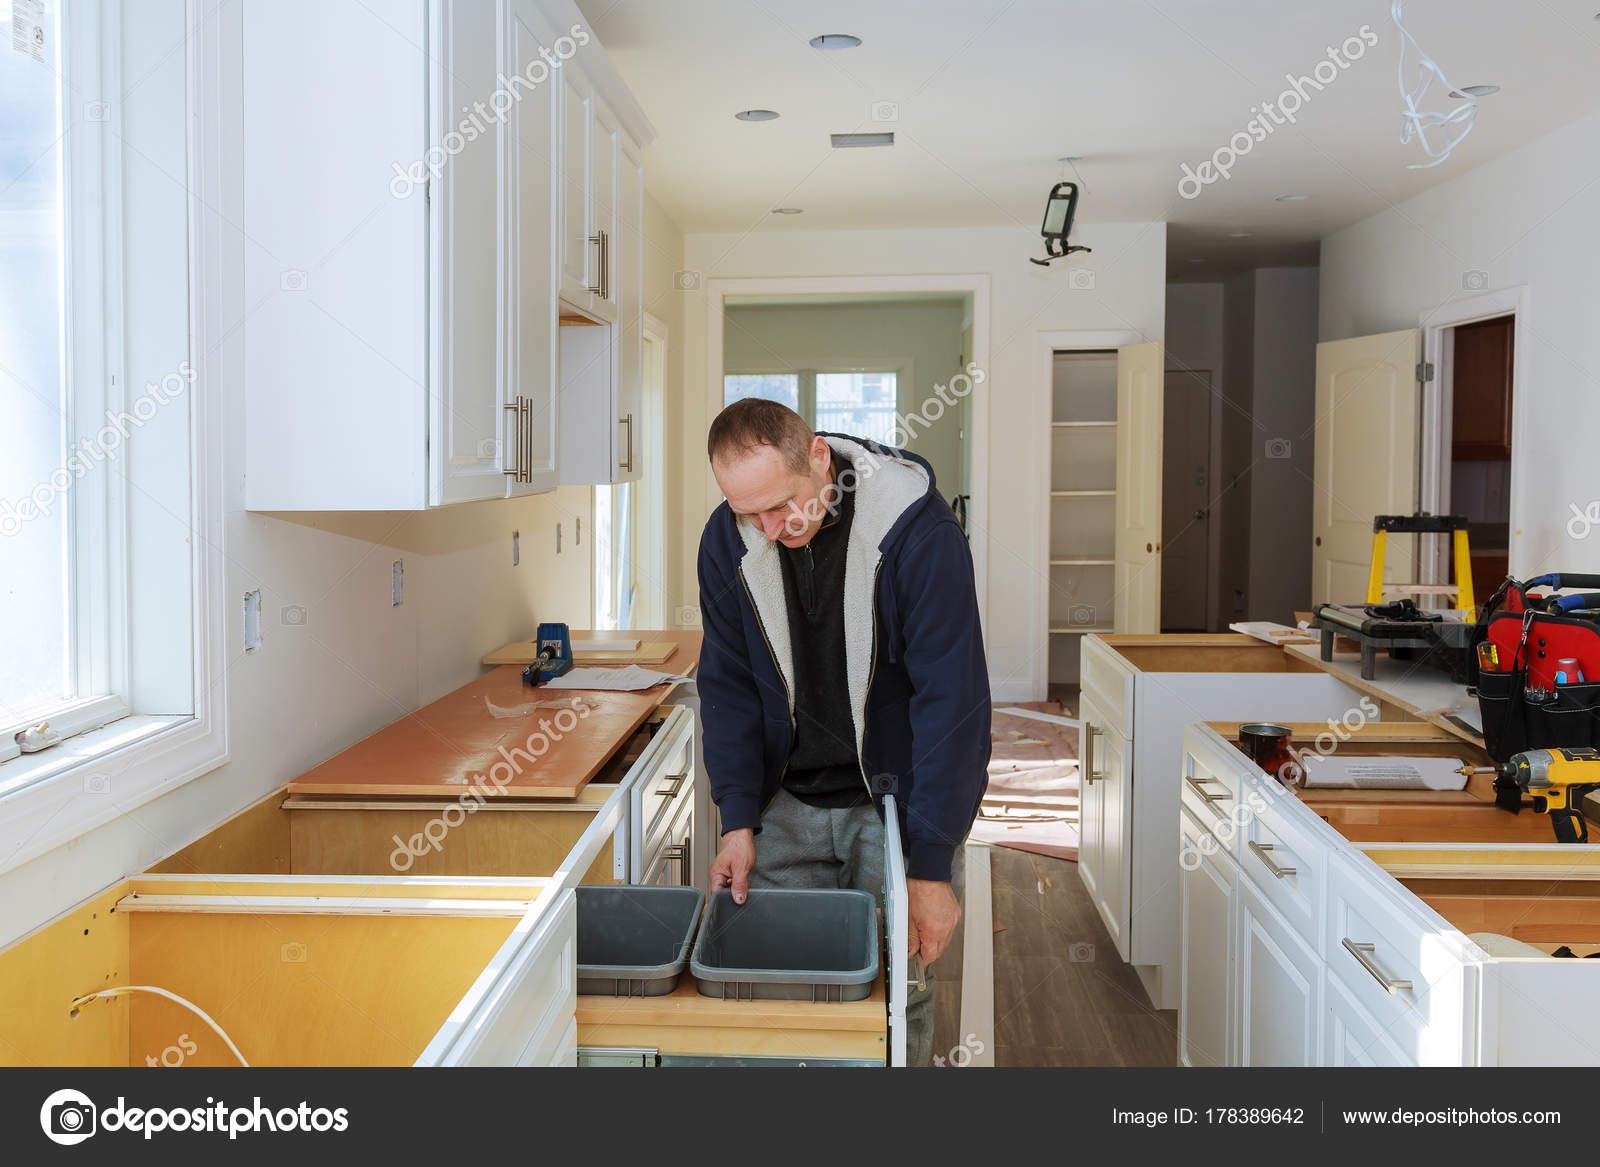 kitchen cabinets set cart table 工人设置在白色的柜子上用螺丝刀安装厨柜 图库照片 c photovs 178389642